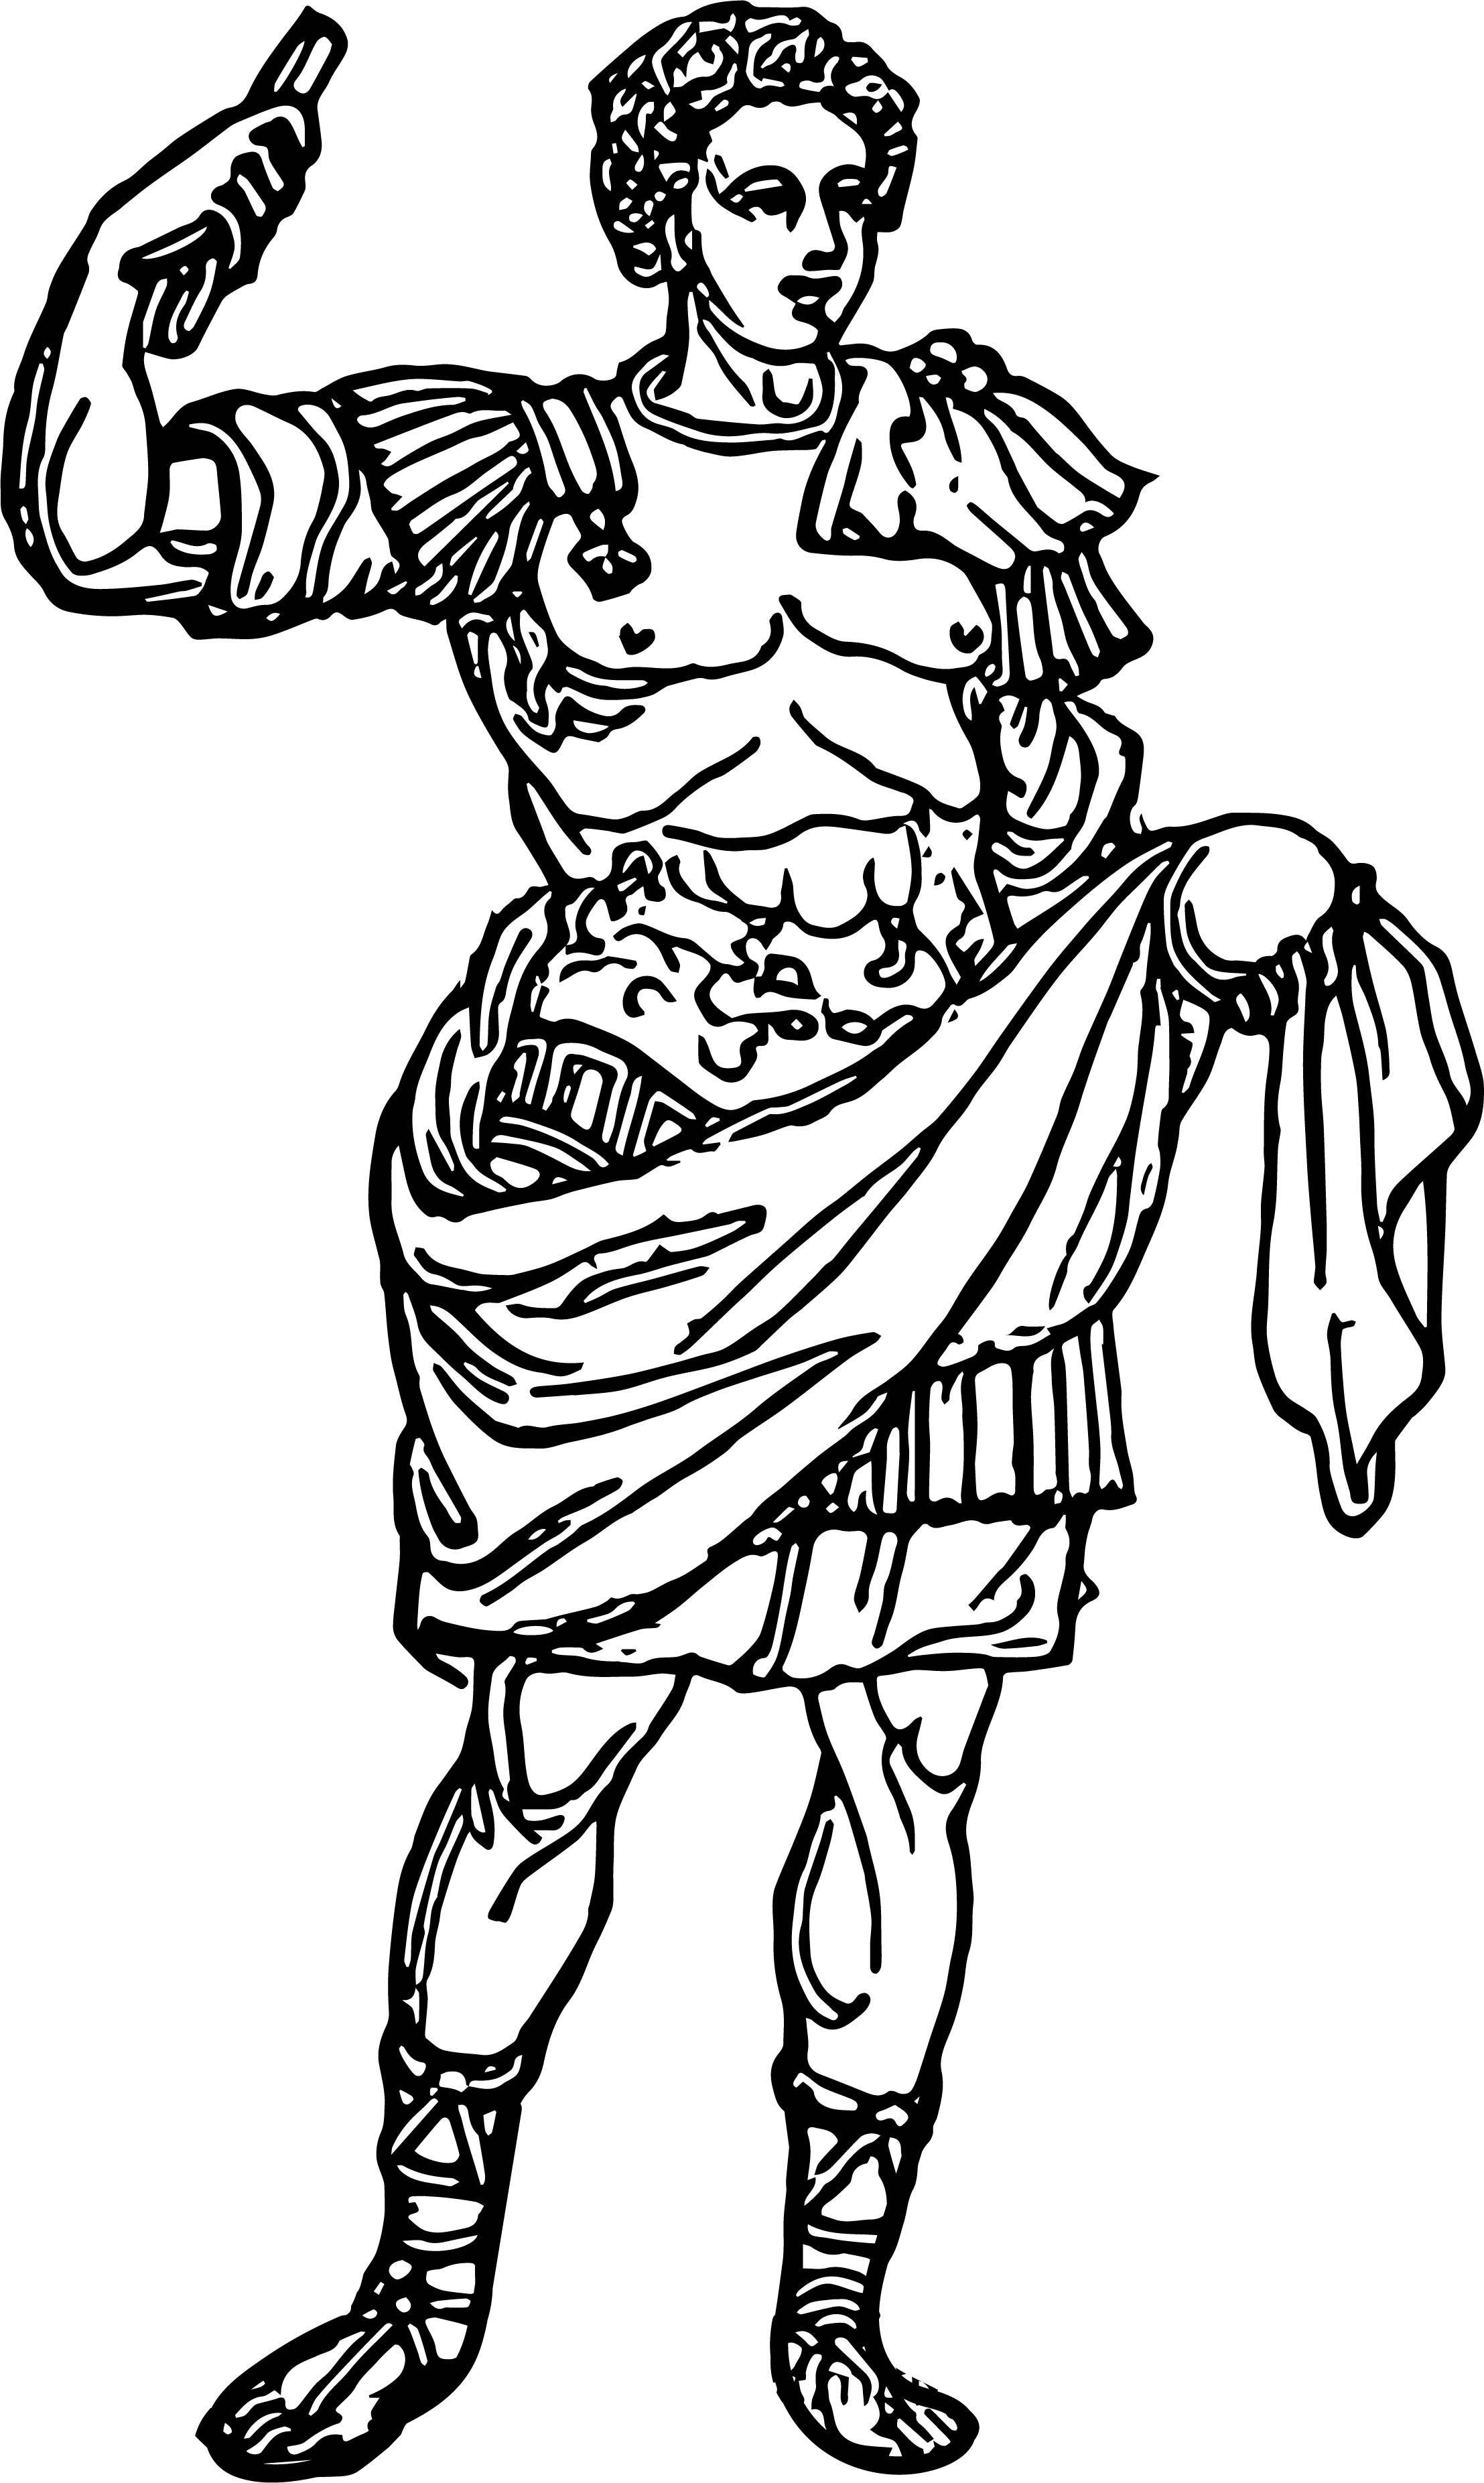 Cool Roman Emperor Man Coloring Page Wecoloringpage